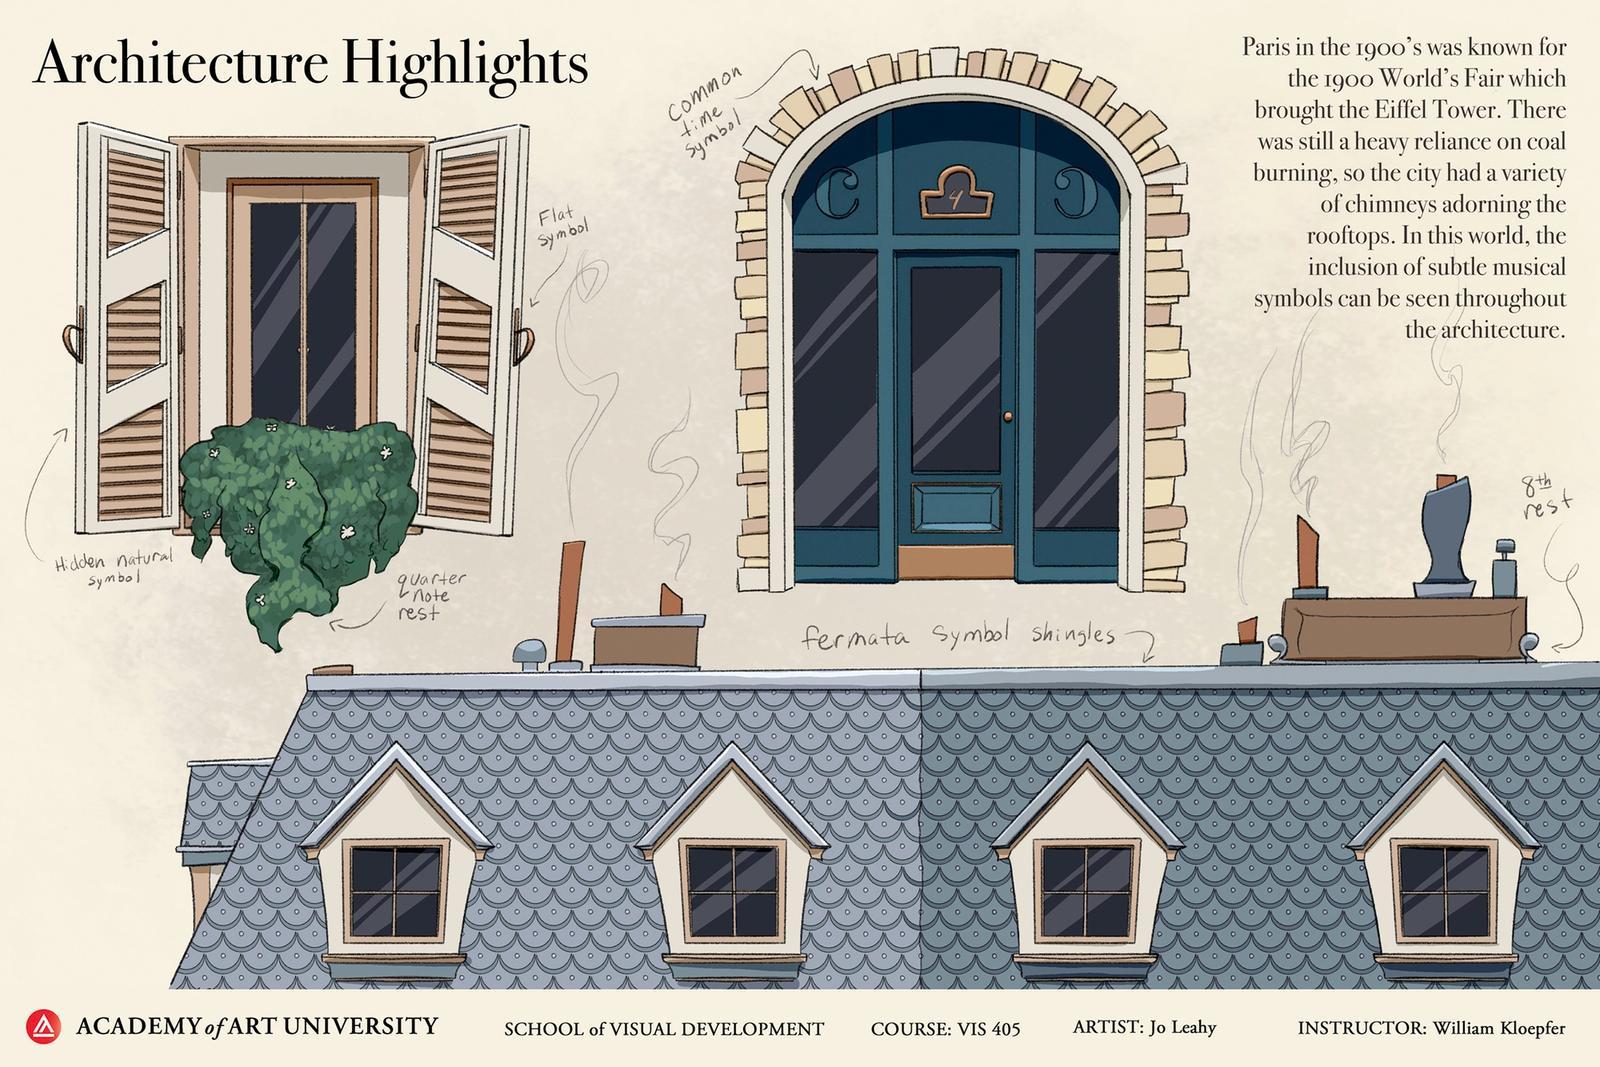 Paris Architecture Highlights - Maestro's Mouse